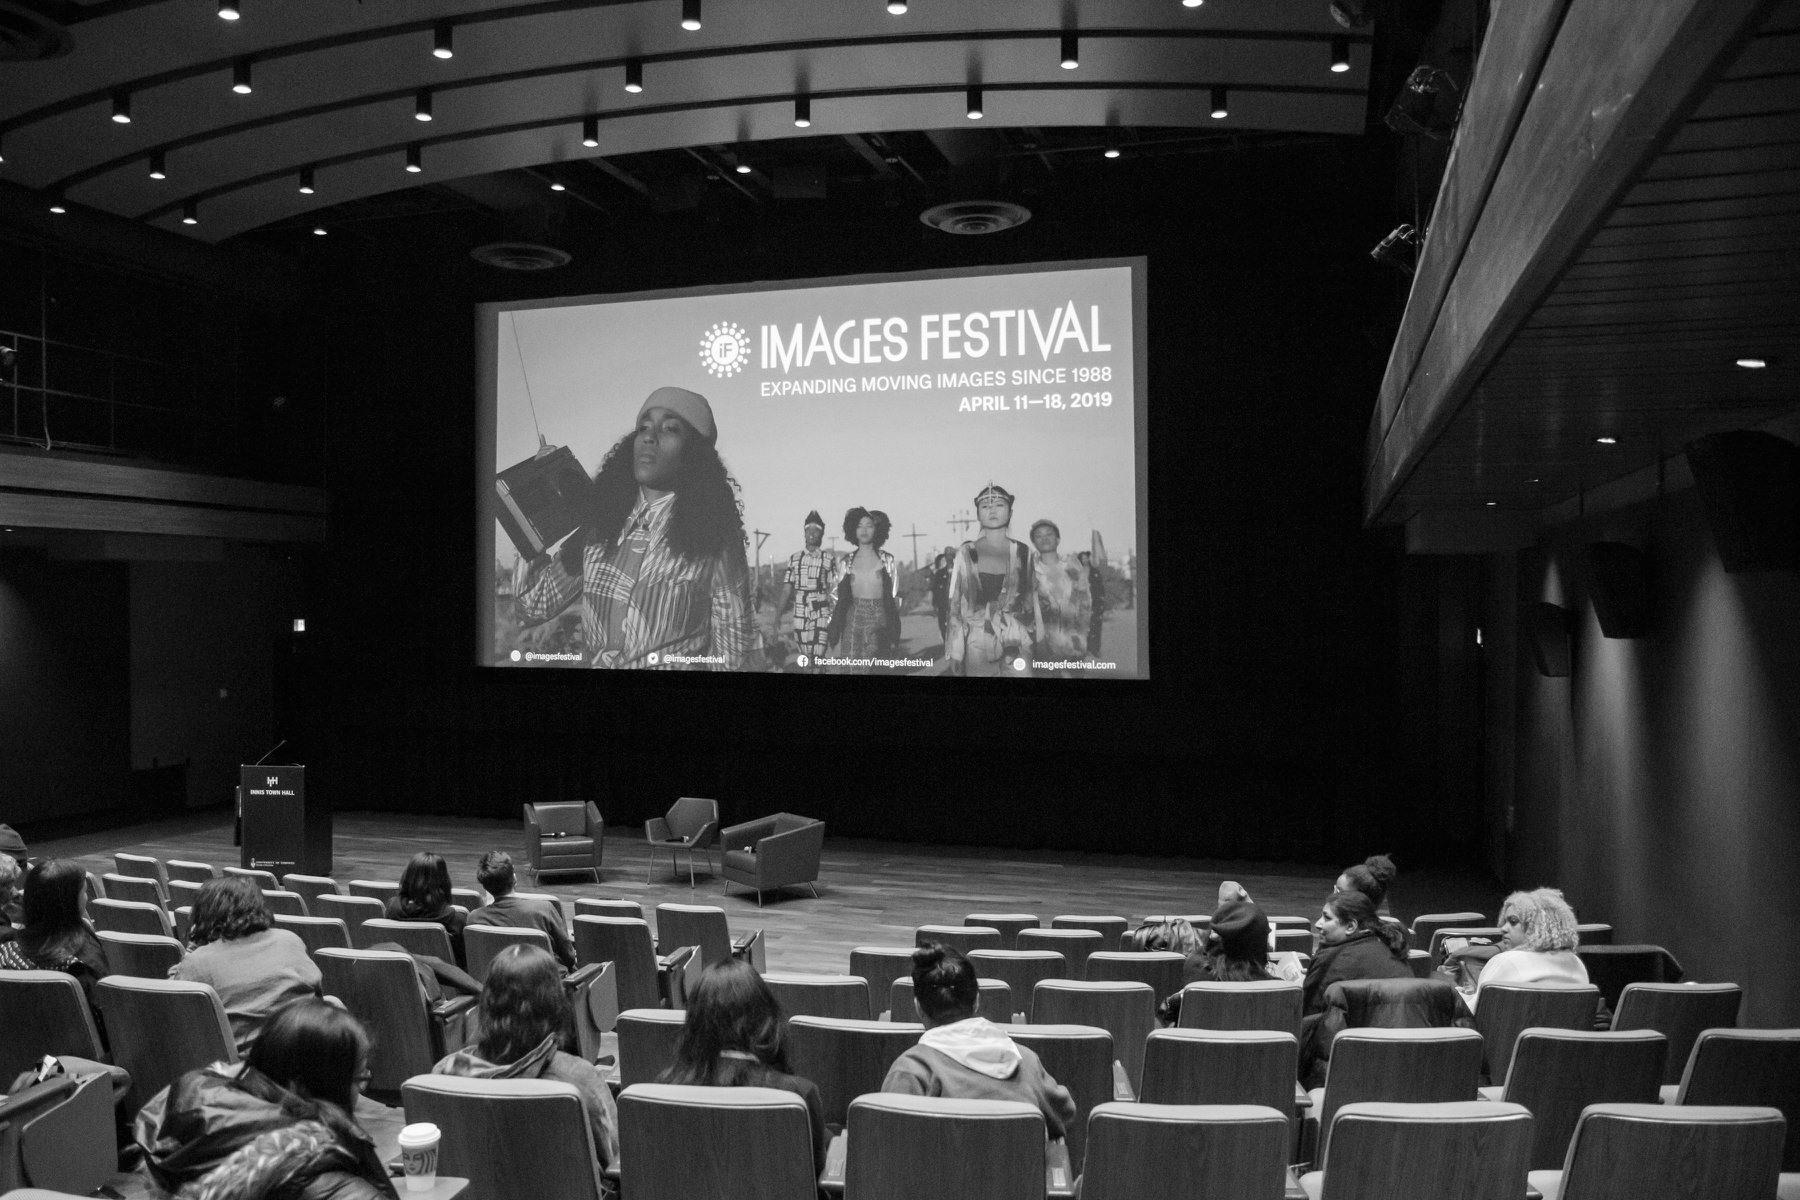 Image source: Images Festival